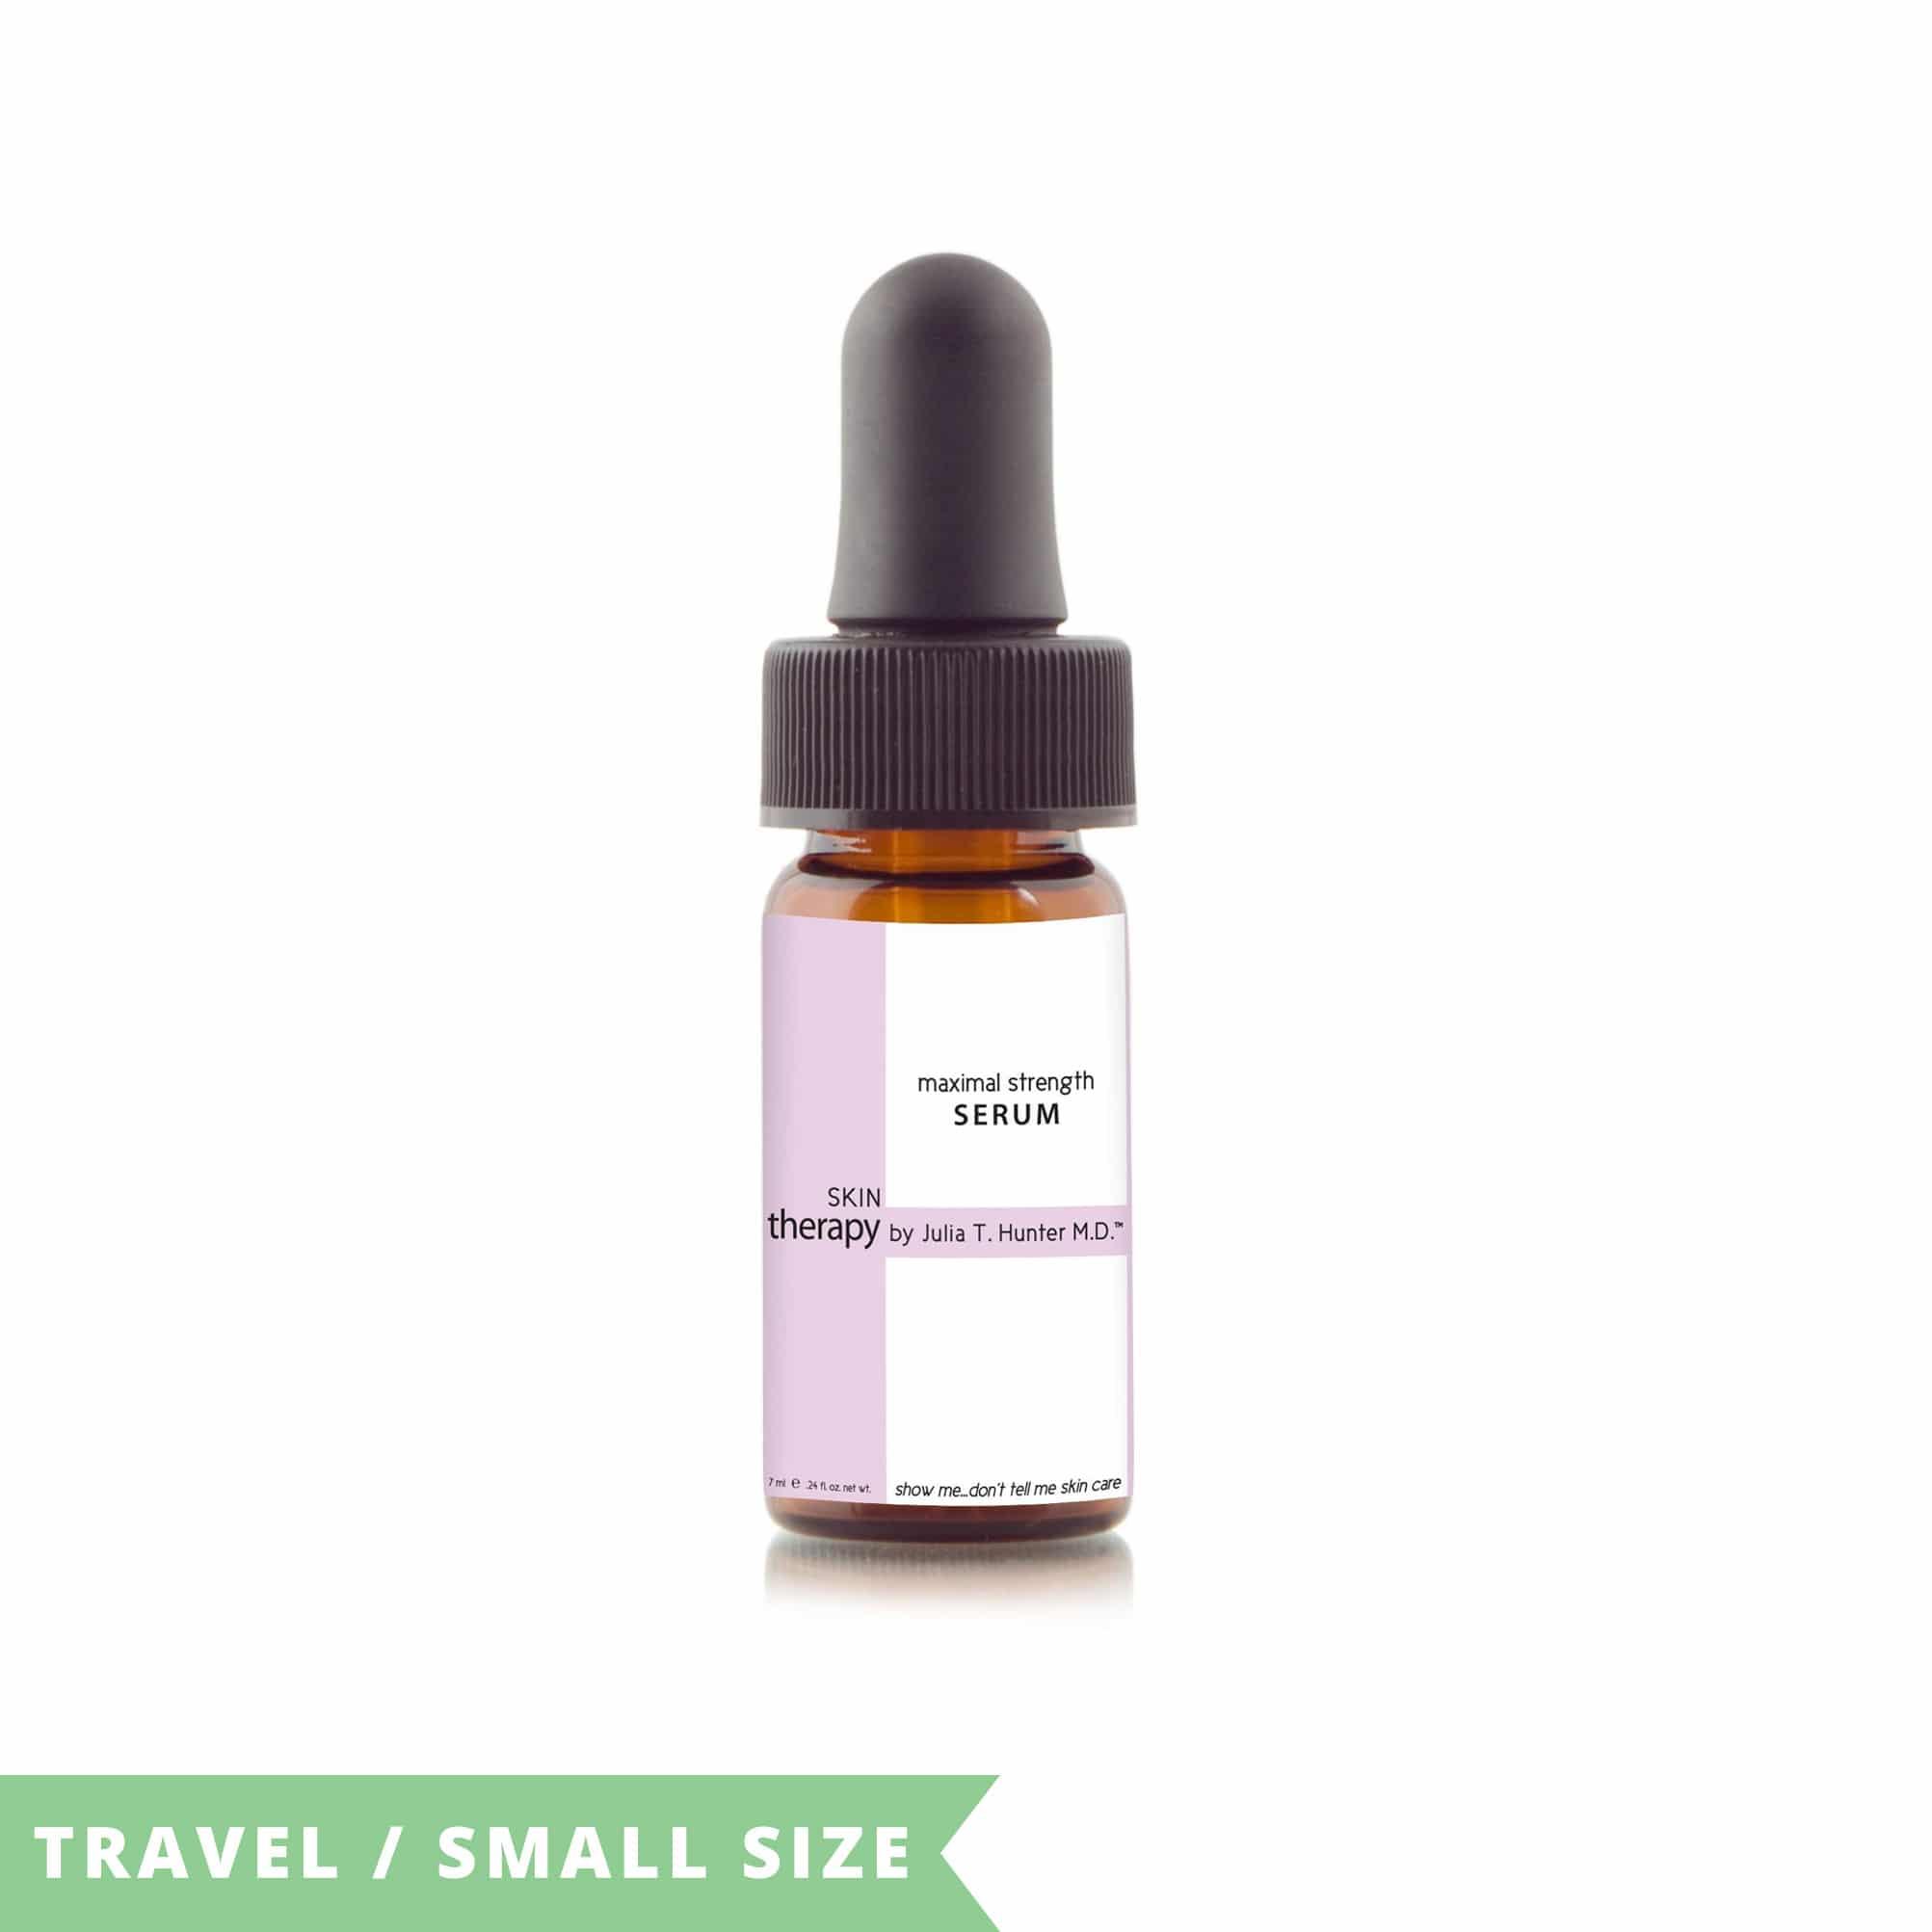 Travel Maximal Strength Serum